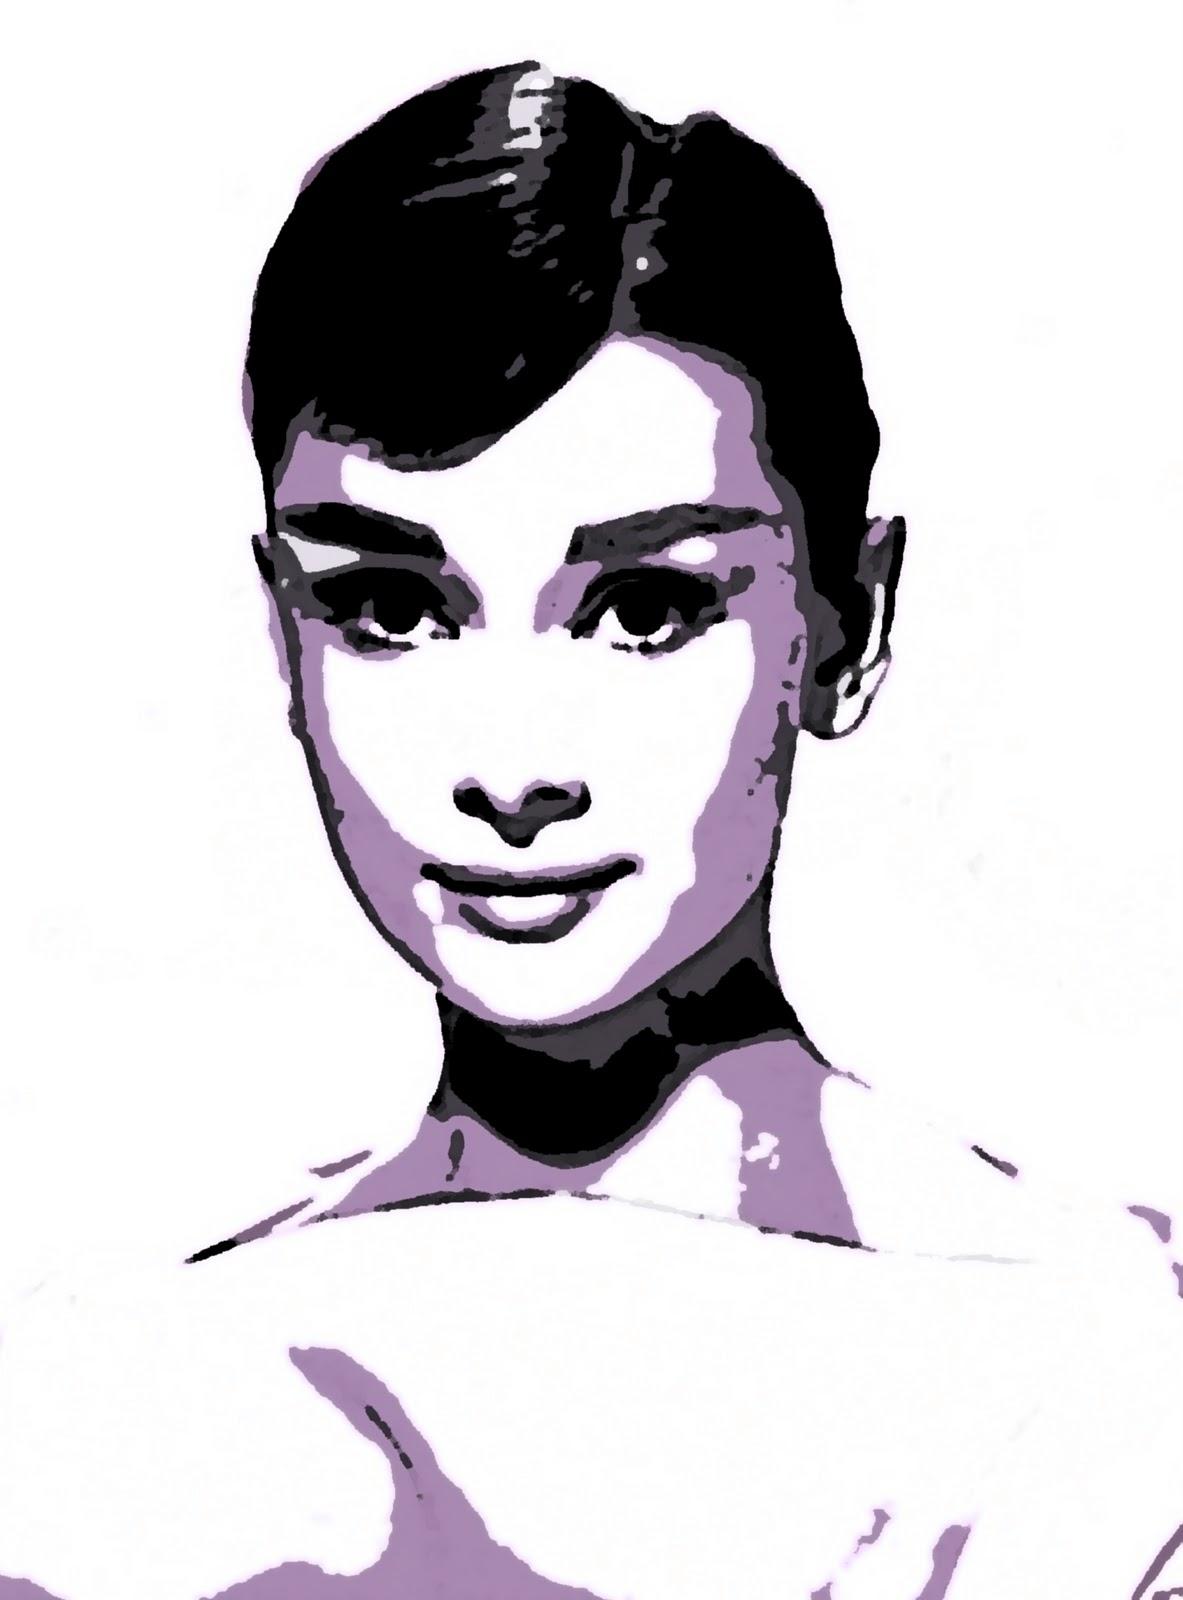 Audrey Hepburn Leinwand Blogtour Hepburn Turtleneck Chribi